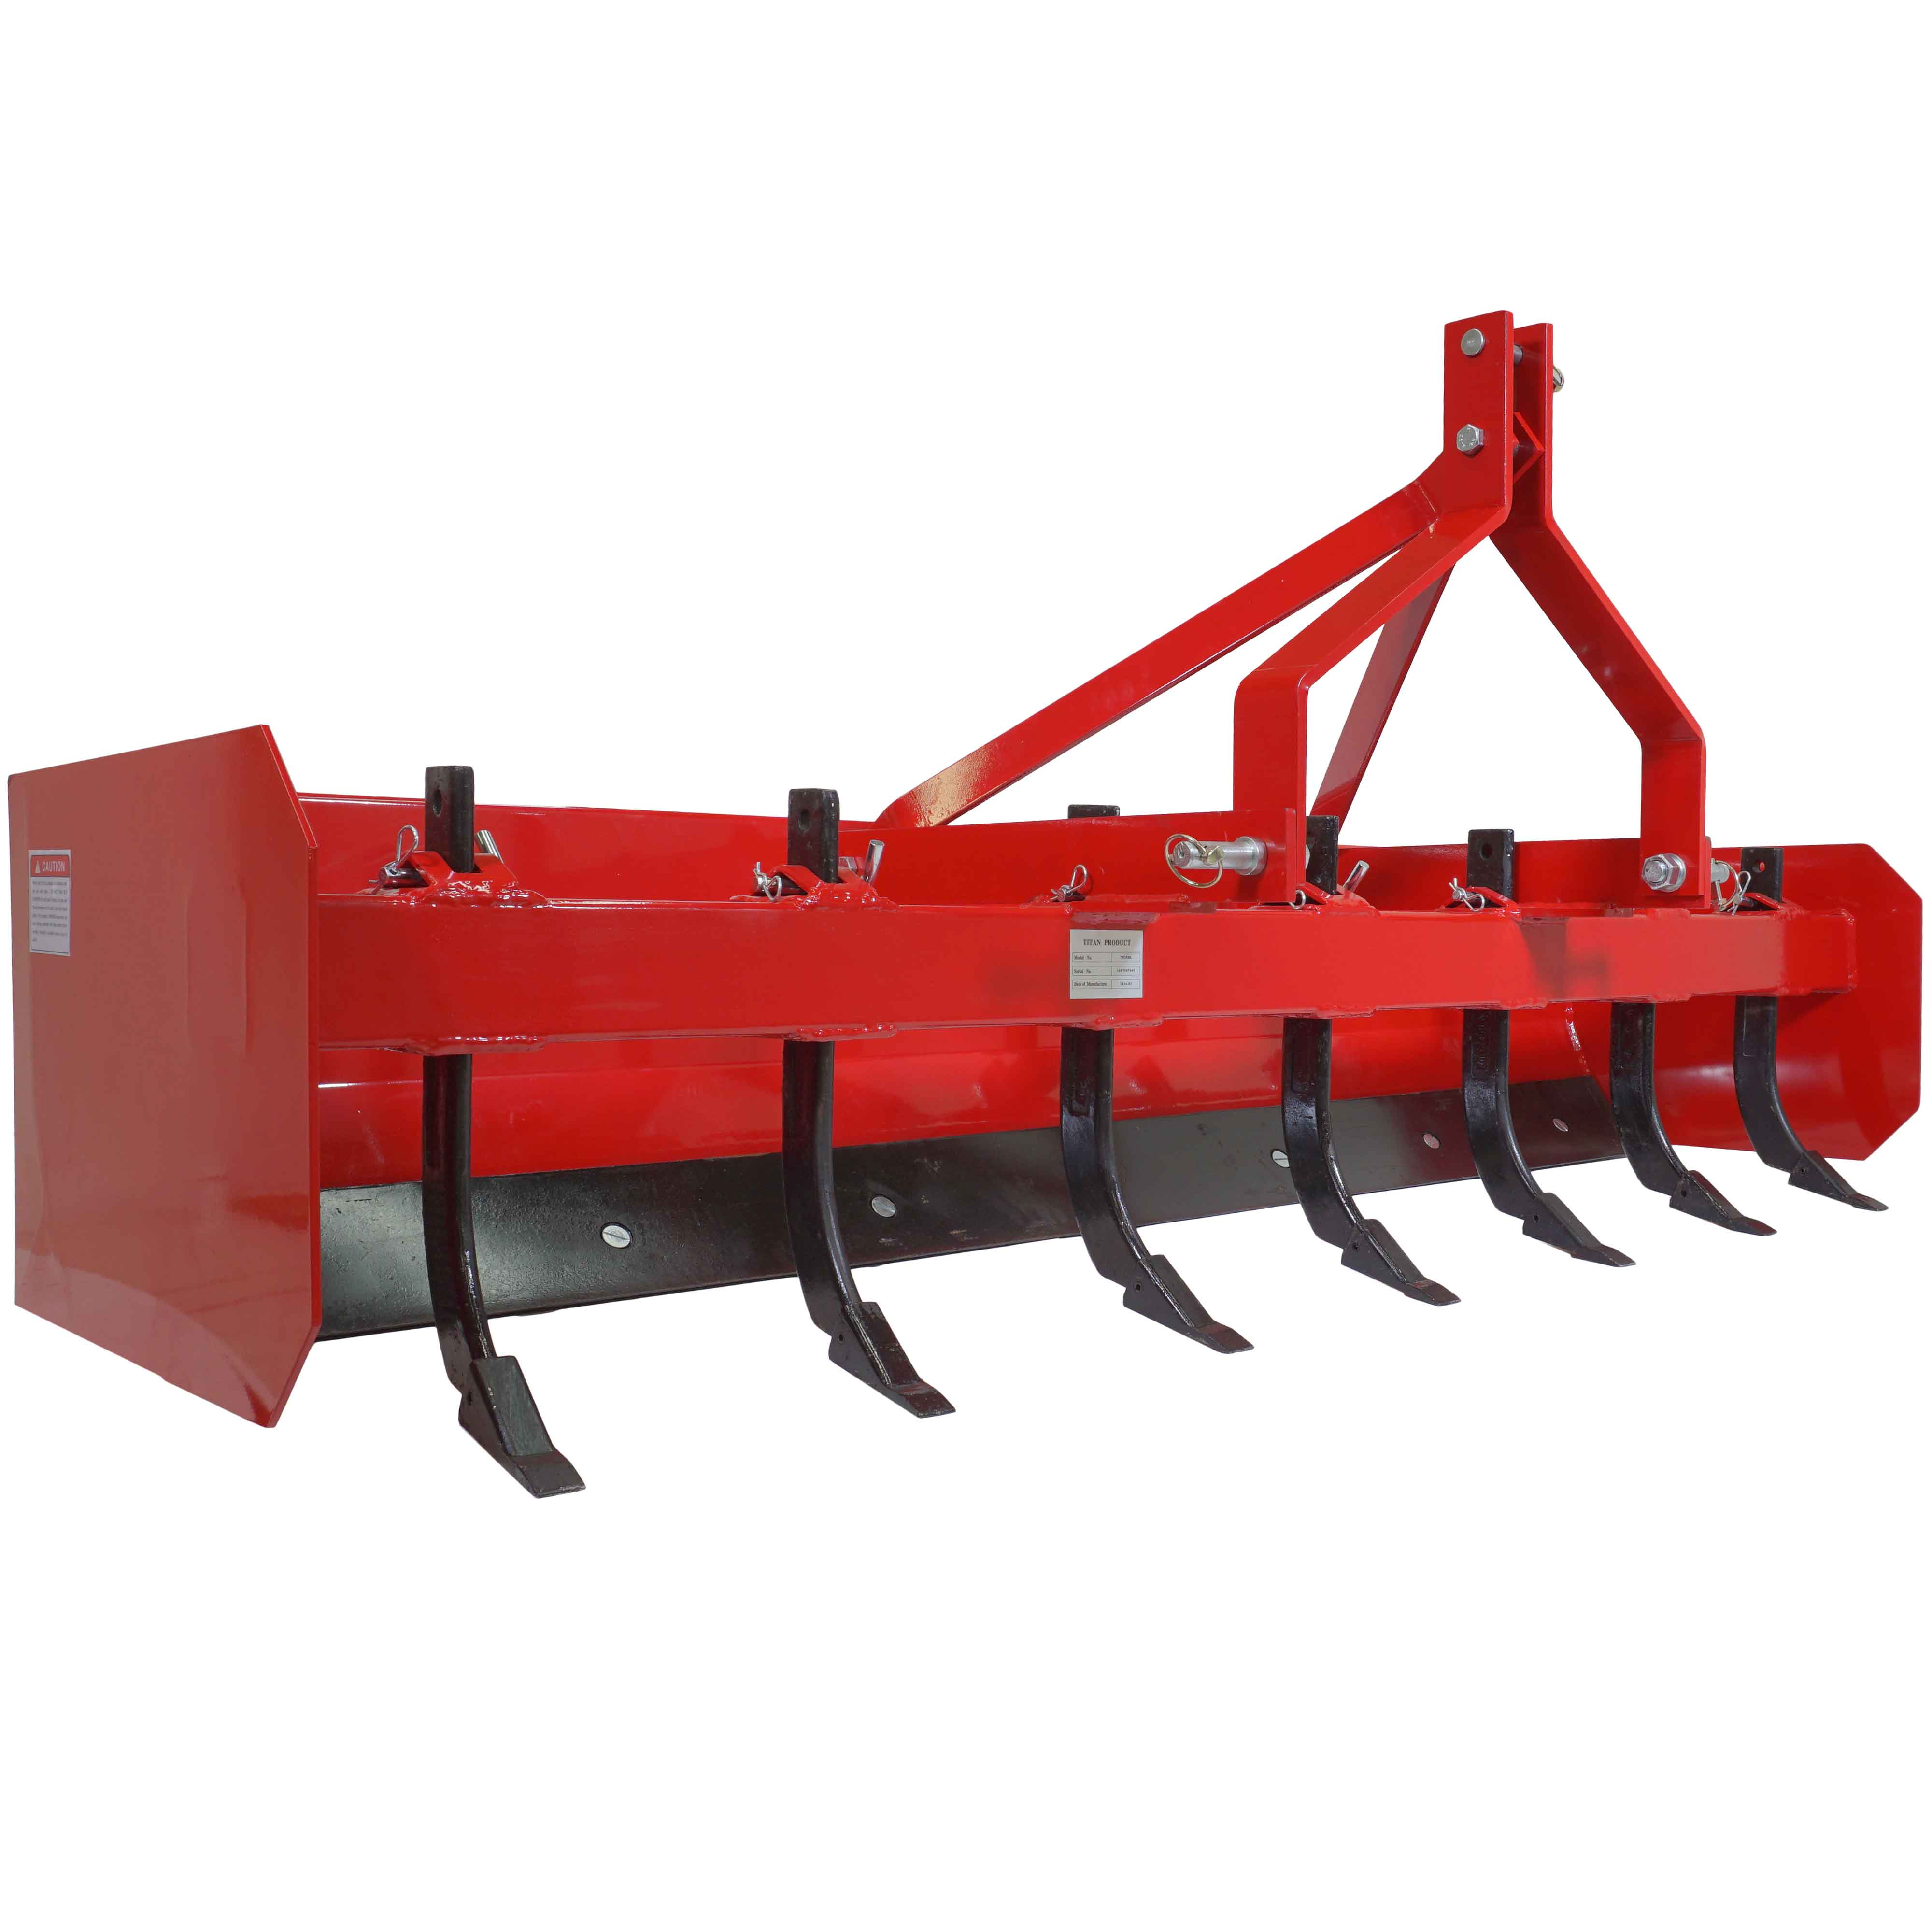 Titan 7' Box Blade Tractor Attachment Category 1 Cat 0 Scarifier Shank Teeth